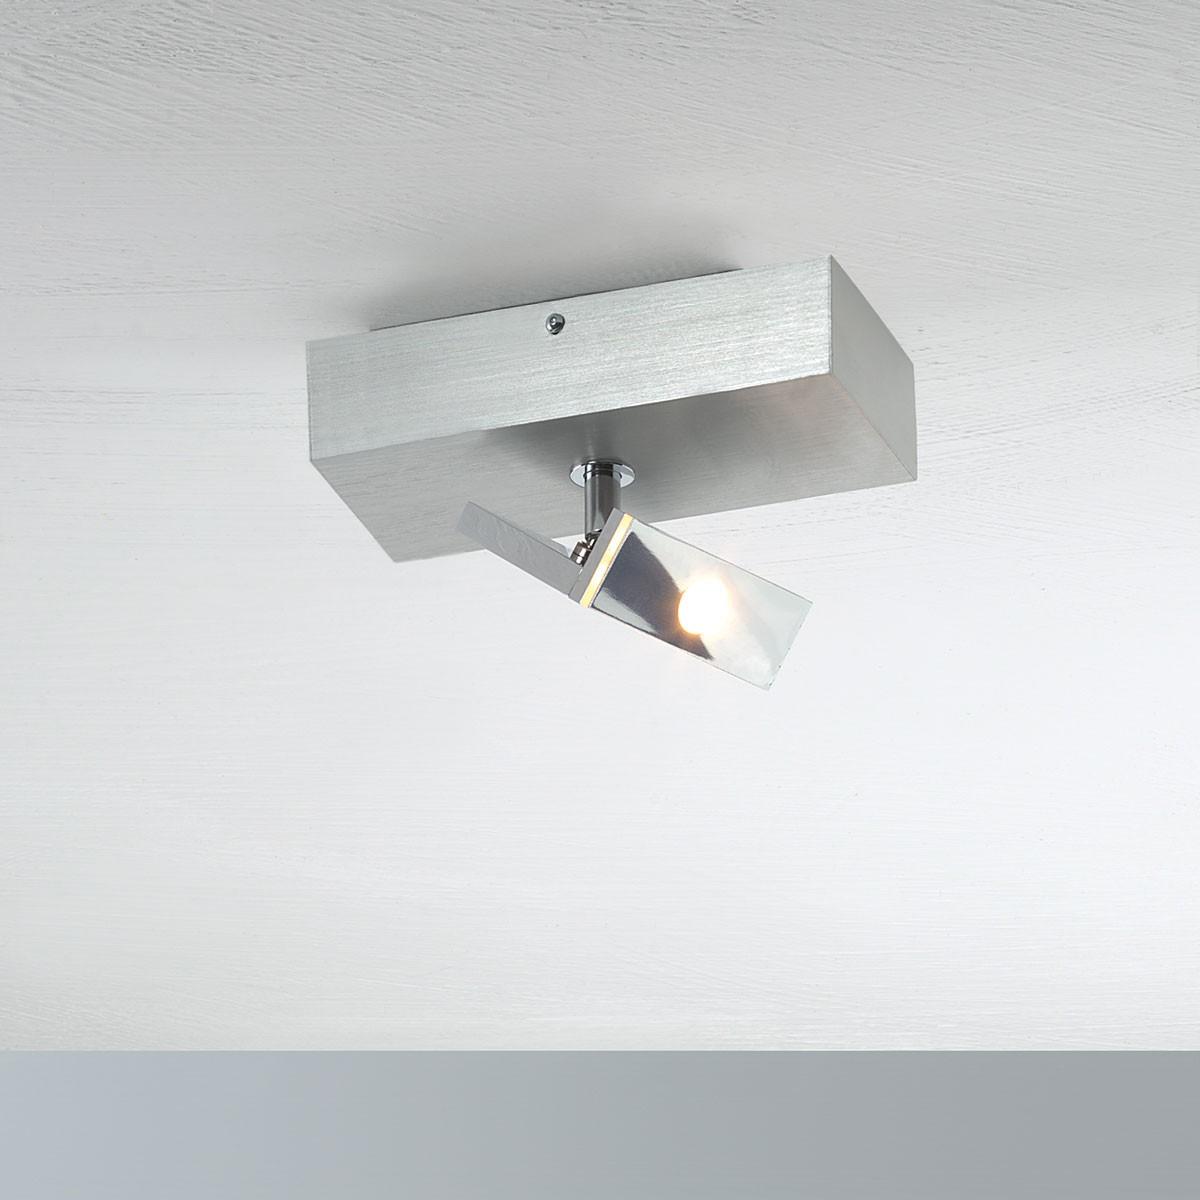 Bopp Elle LED Deckenleuchte, 1-flg., Aluminium geschliffen